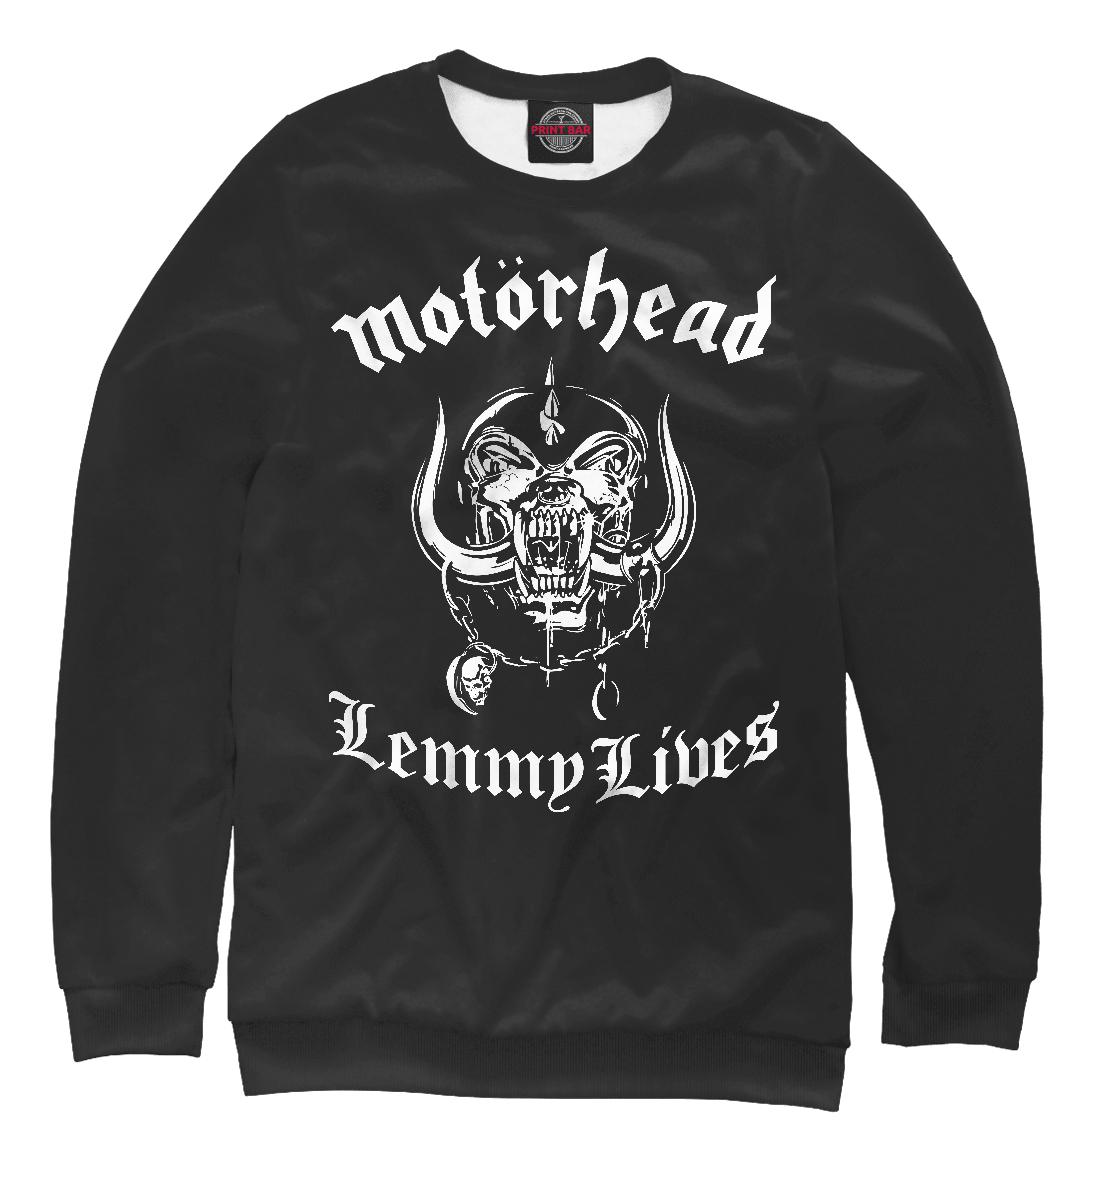 Купить Motorhead, Printbar, Свитшоты, MZK-550058-swi-2